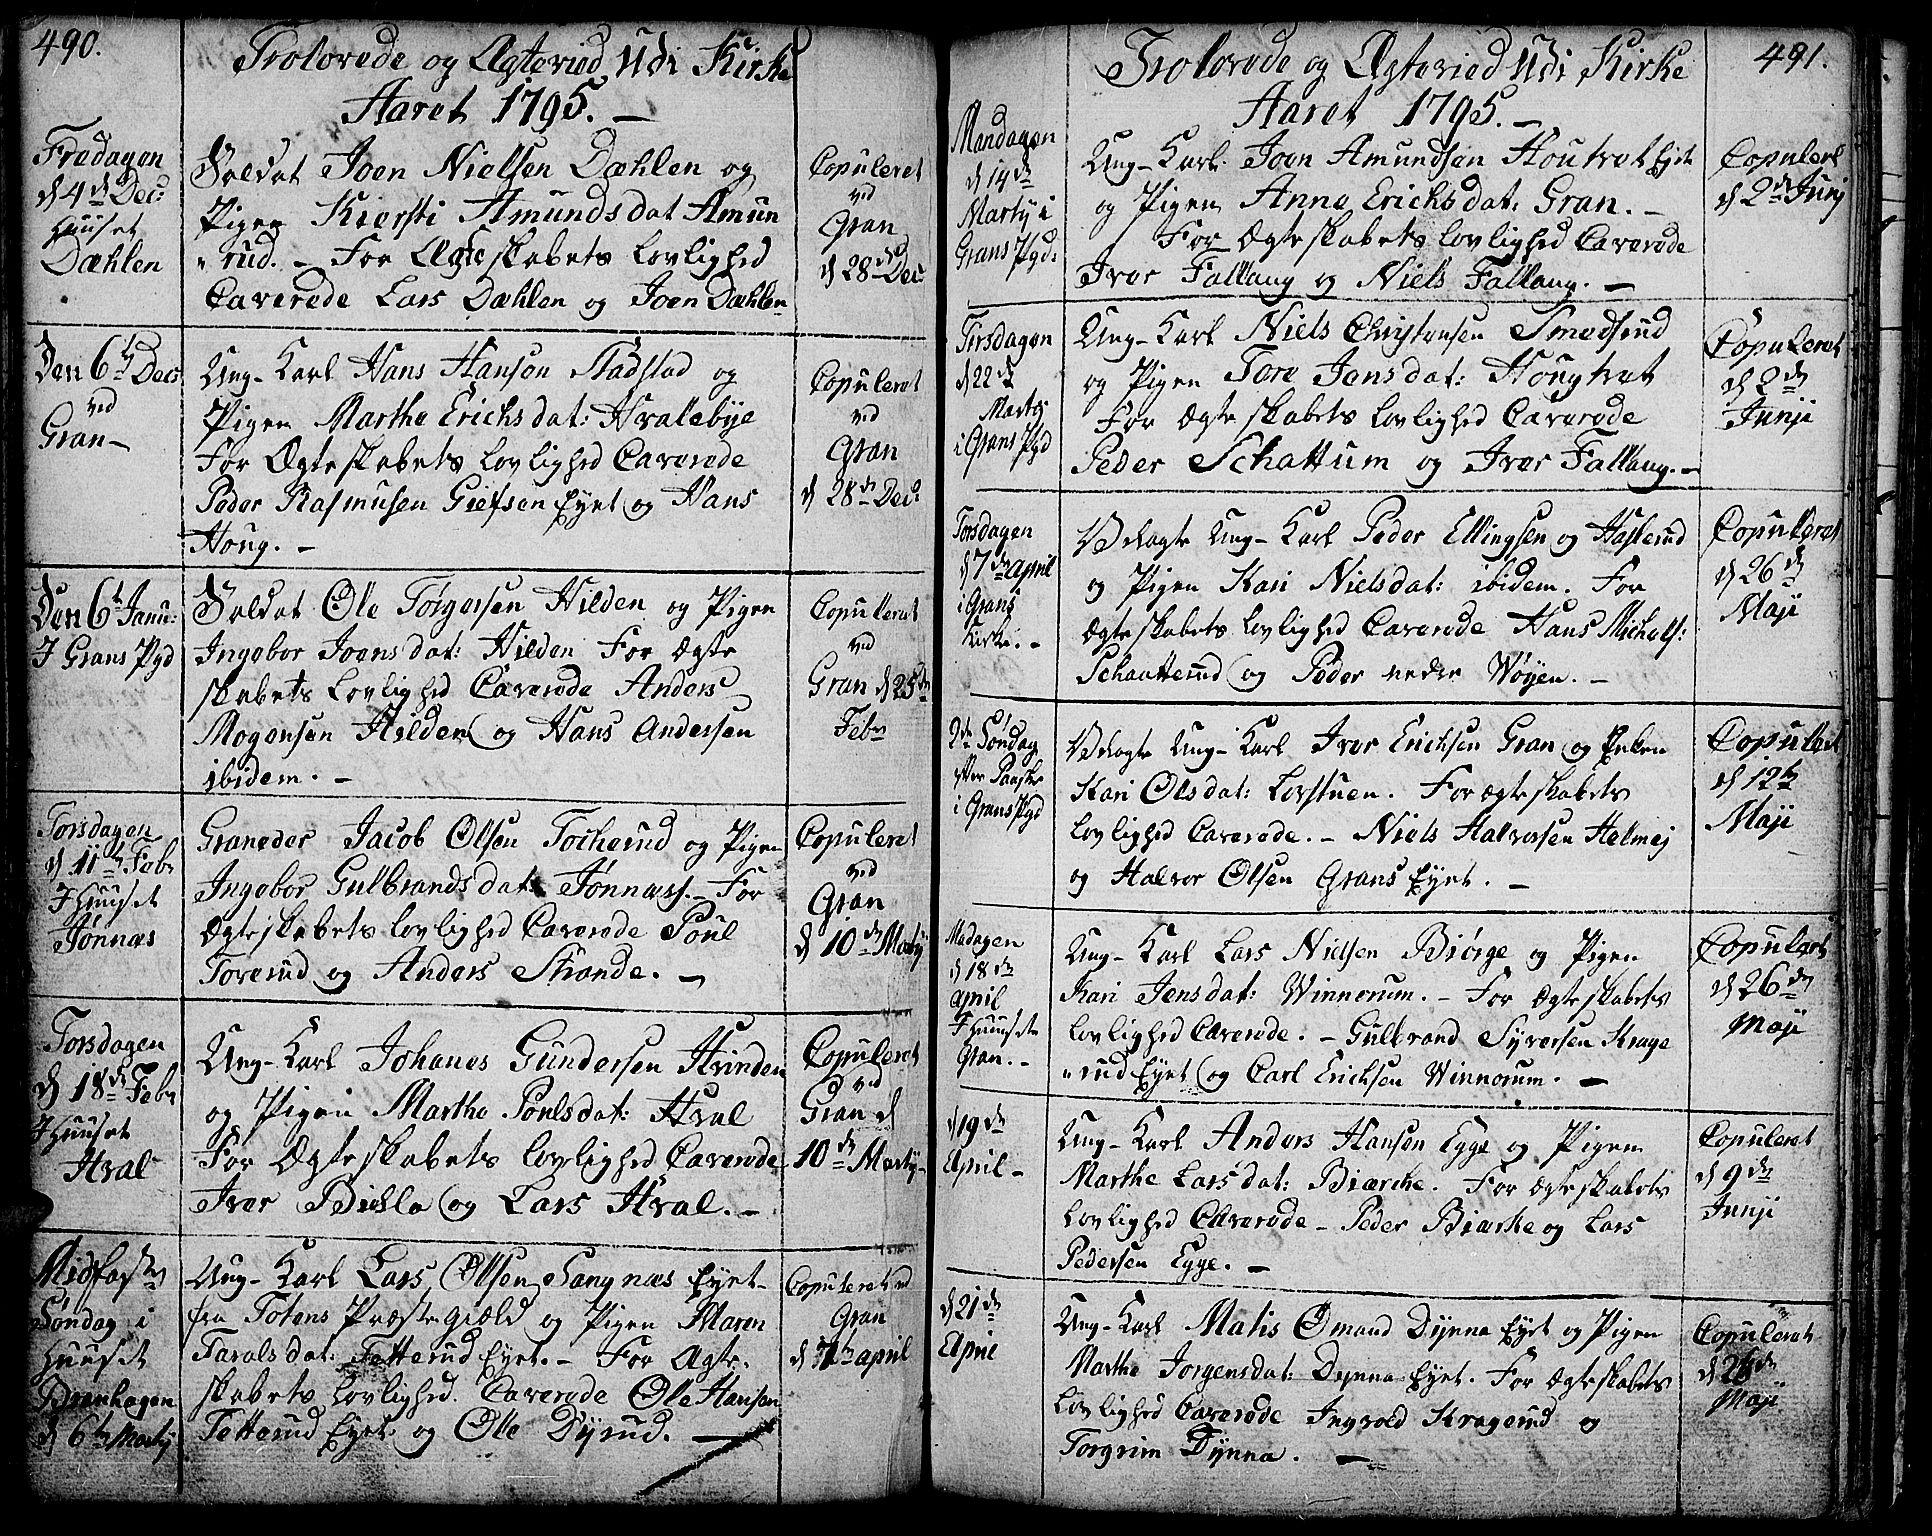 SAH, Gran prestekontor, Ministerialbok nr. 6, 1787-1824, s. 490-491